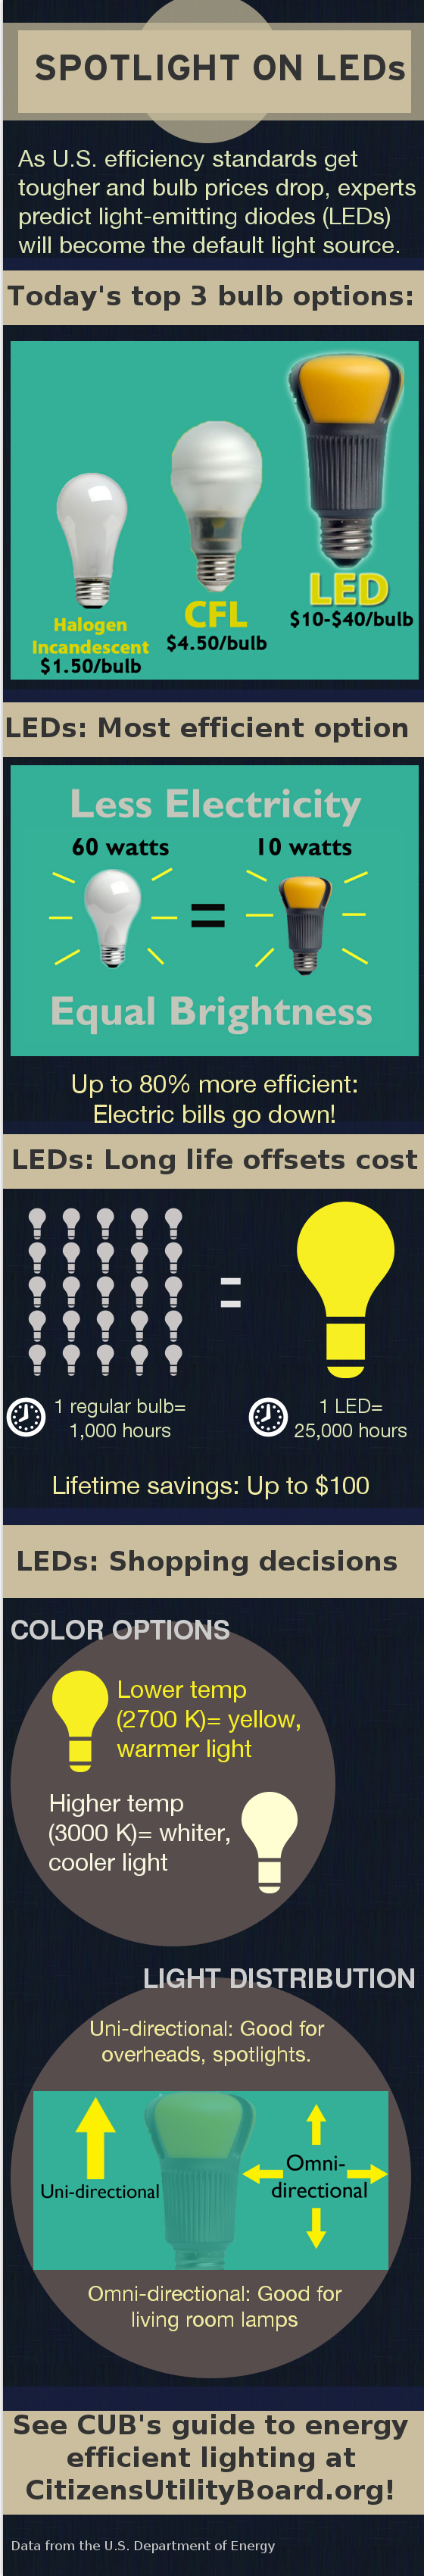 led_infographic_draft4